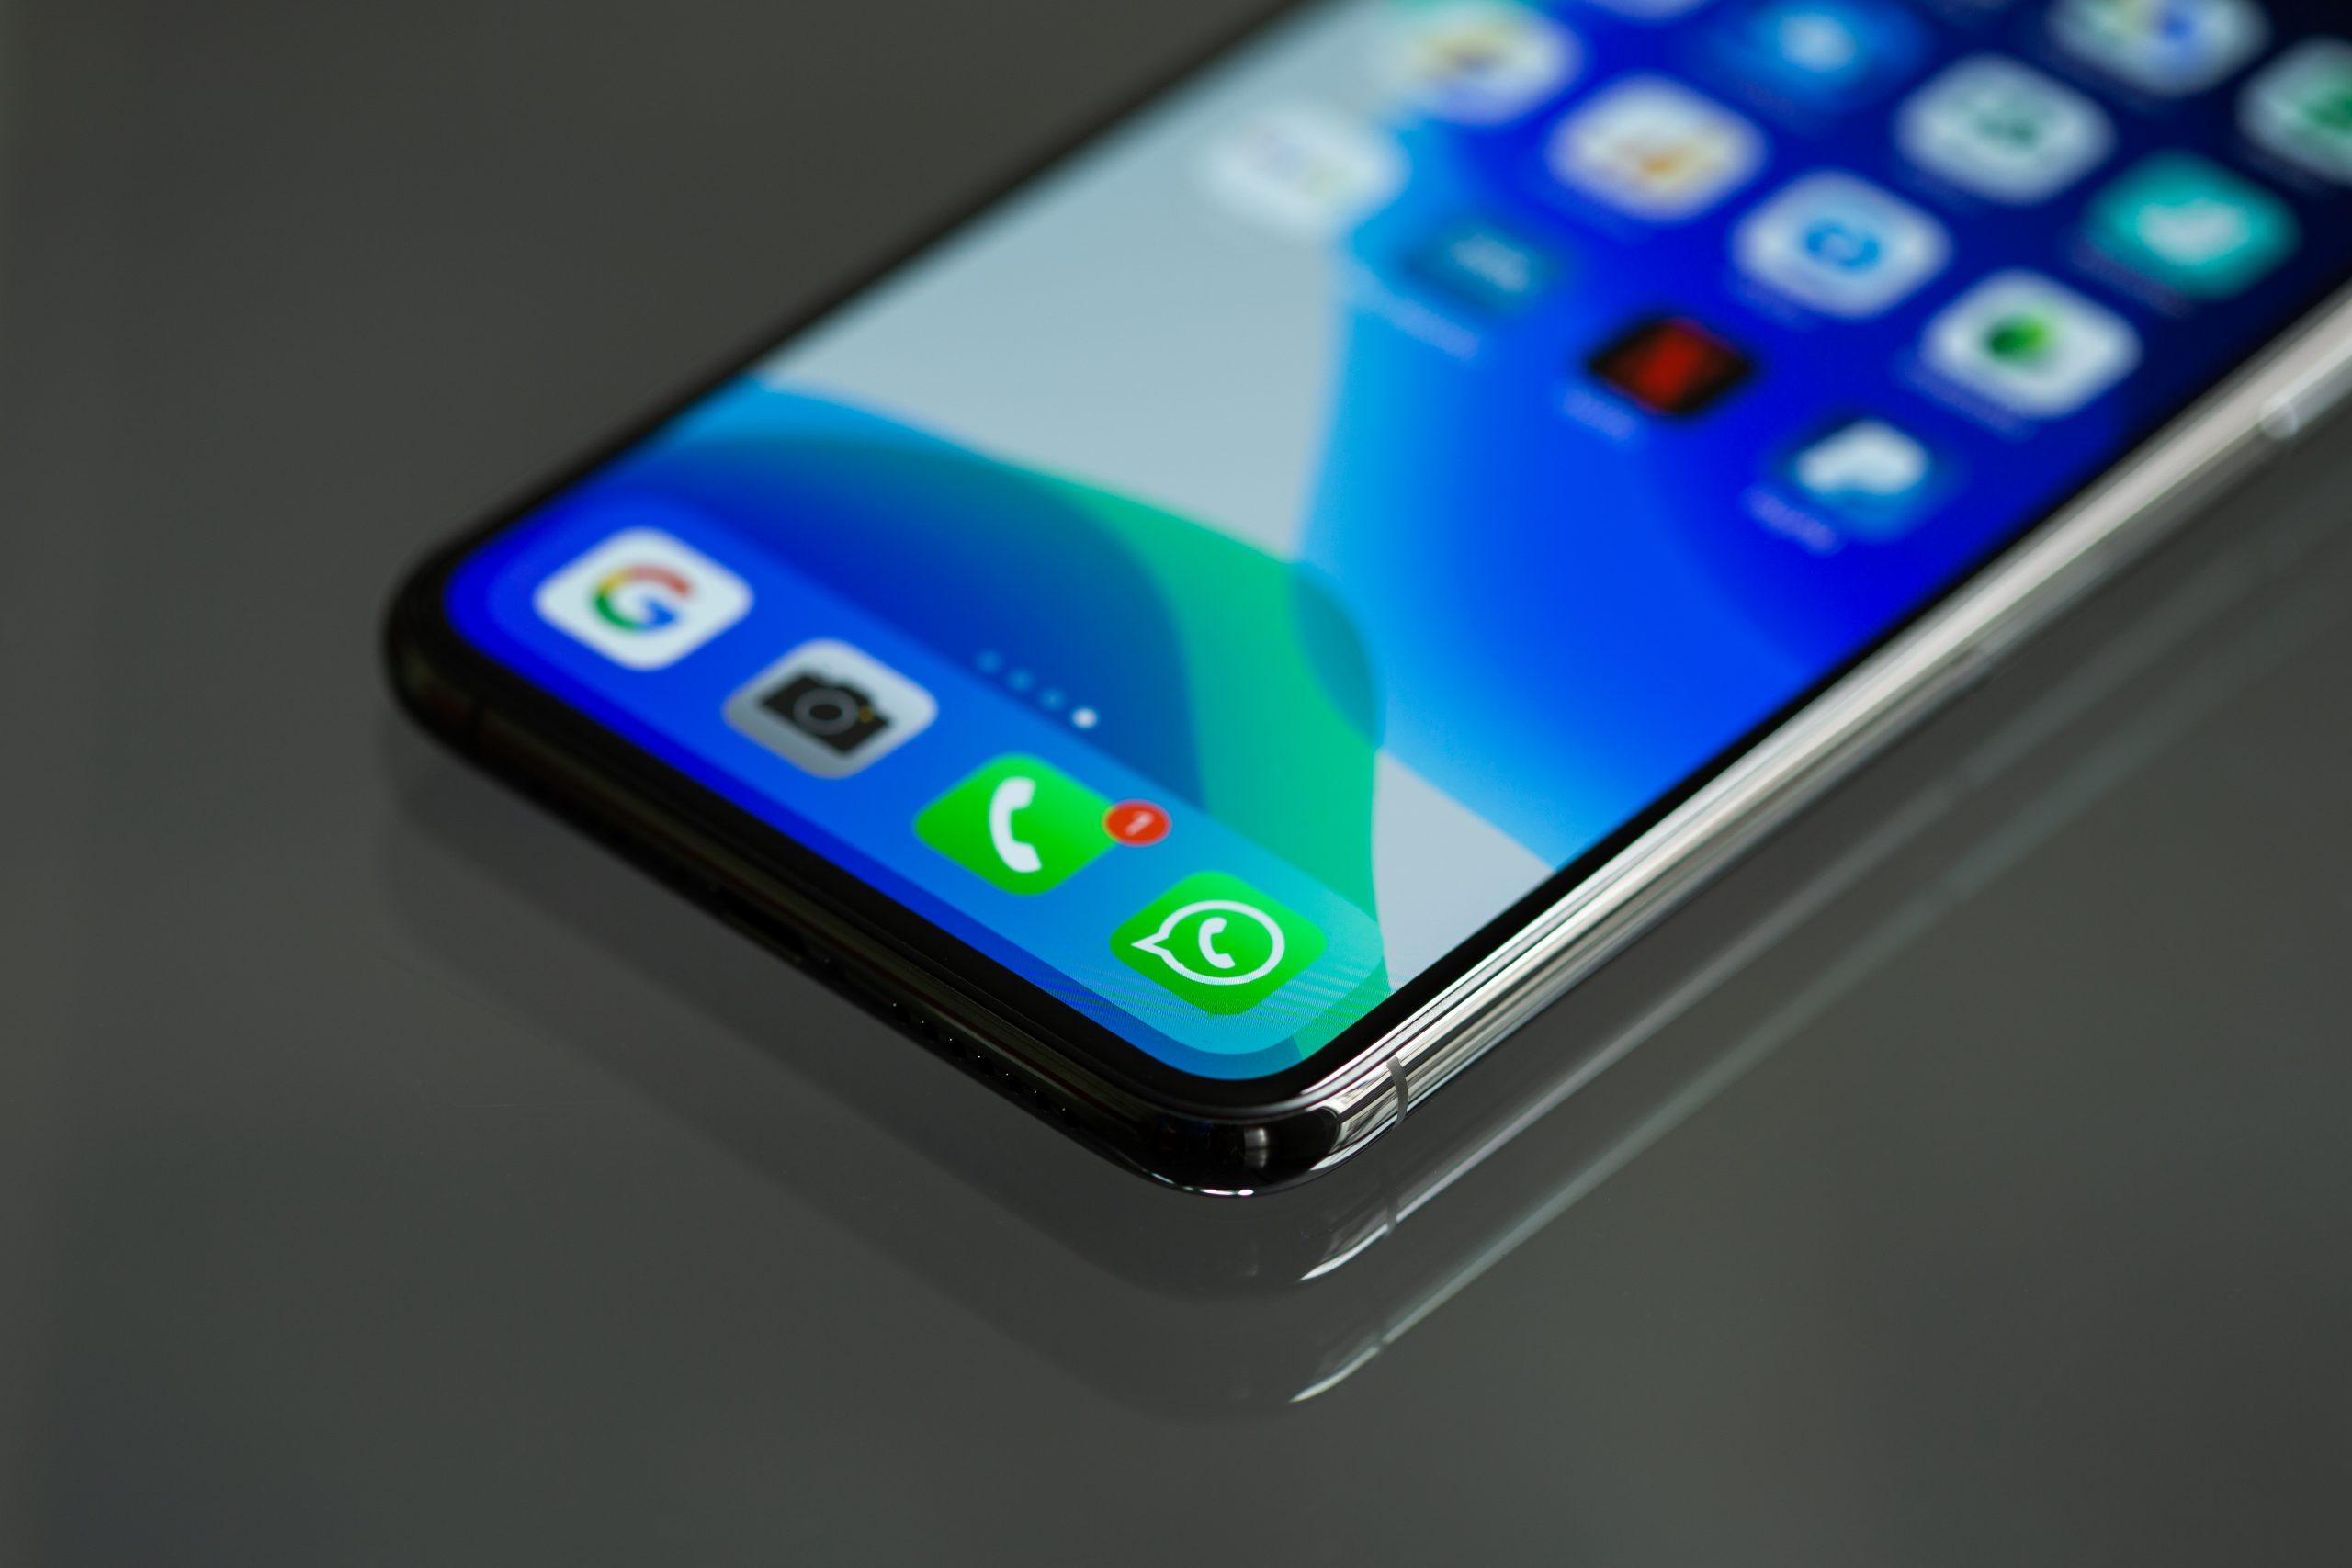 Close up photo of smartphone